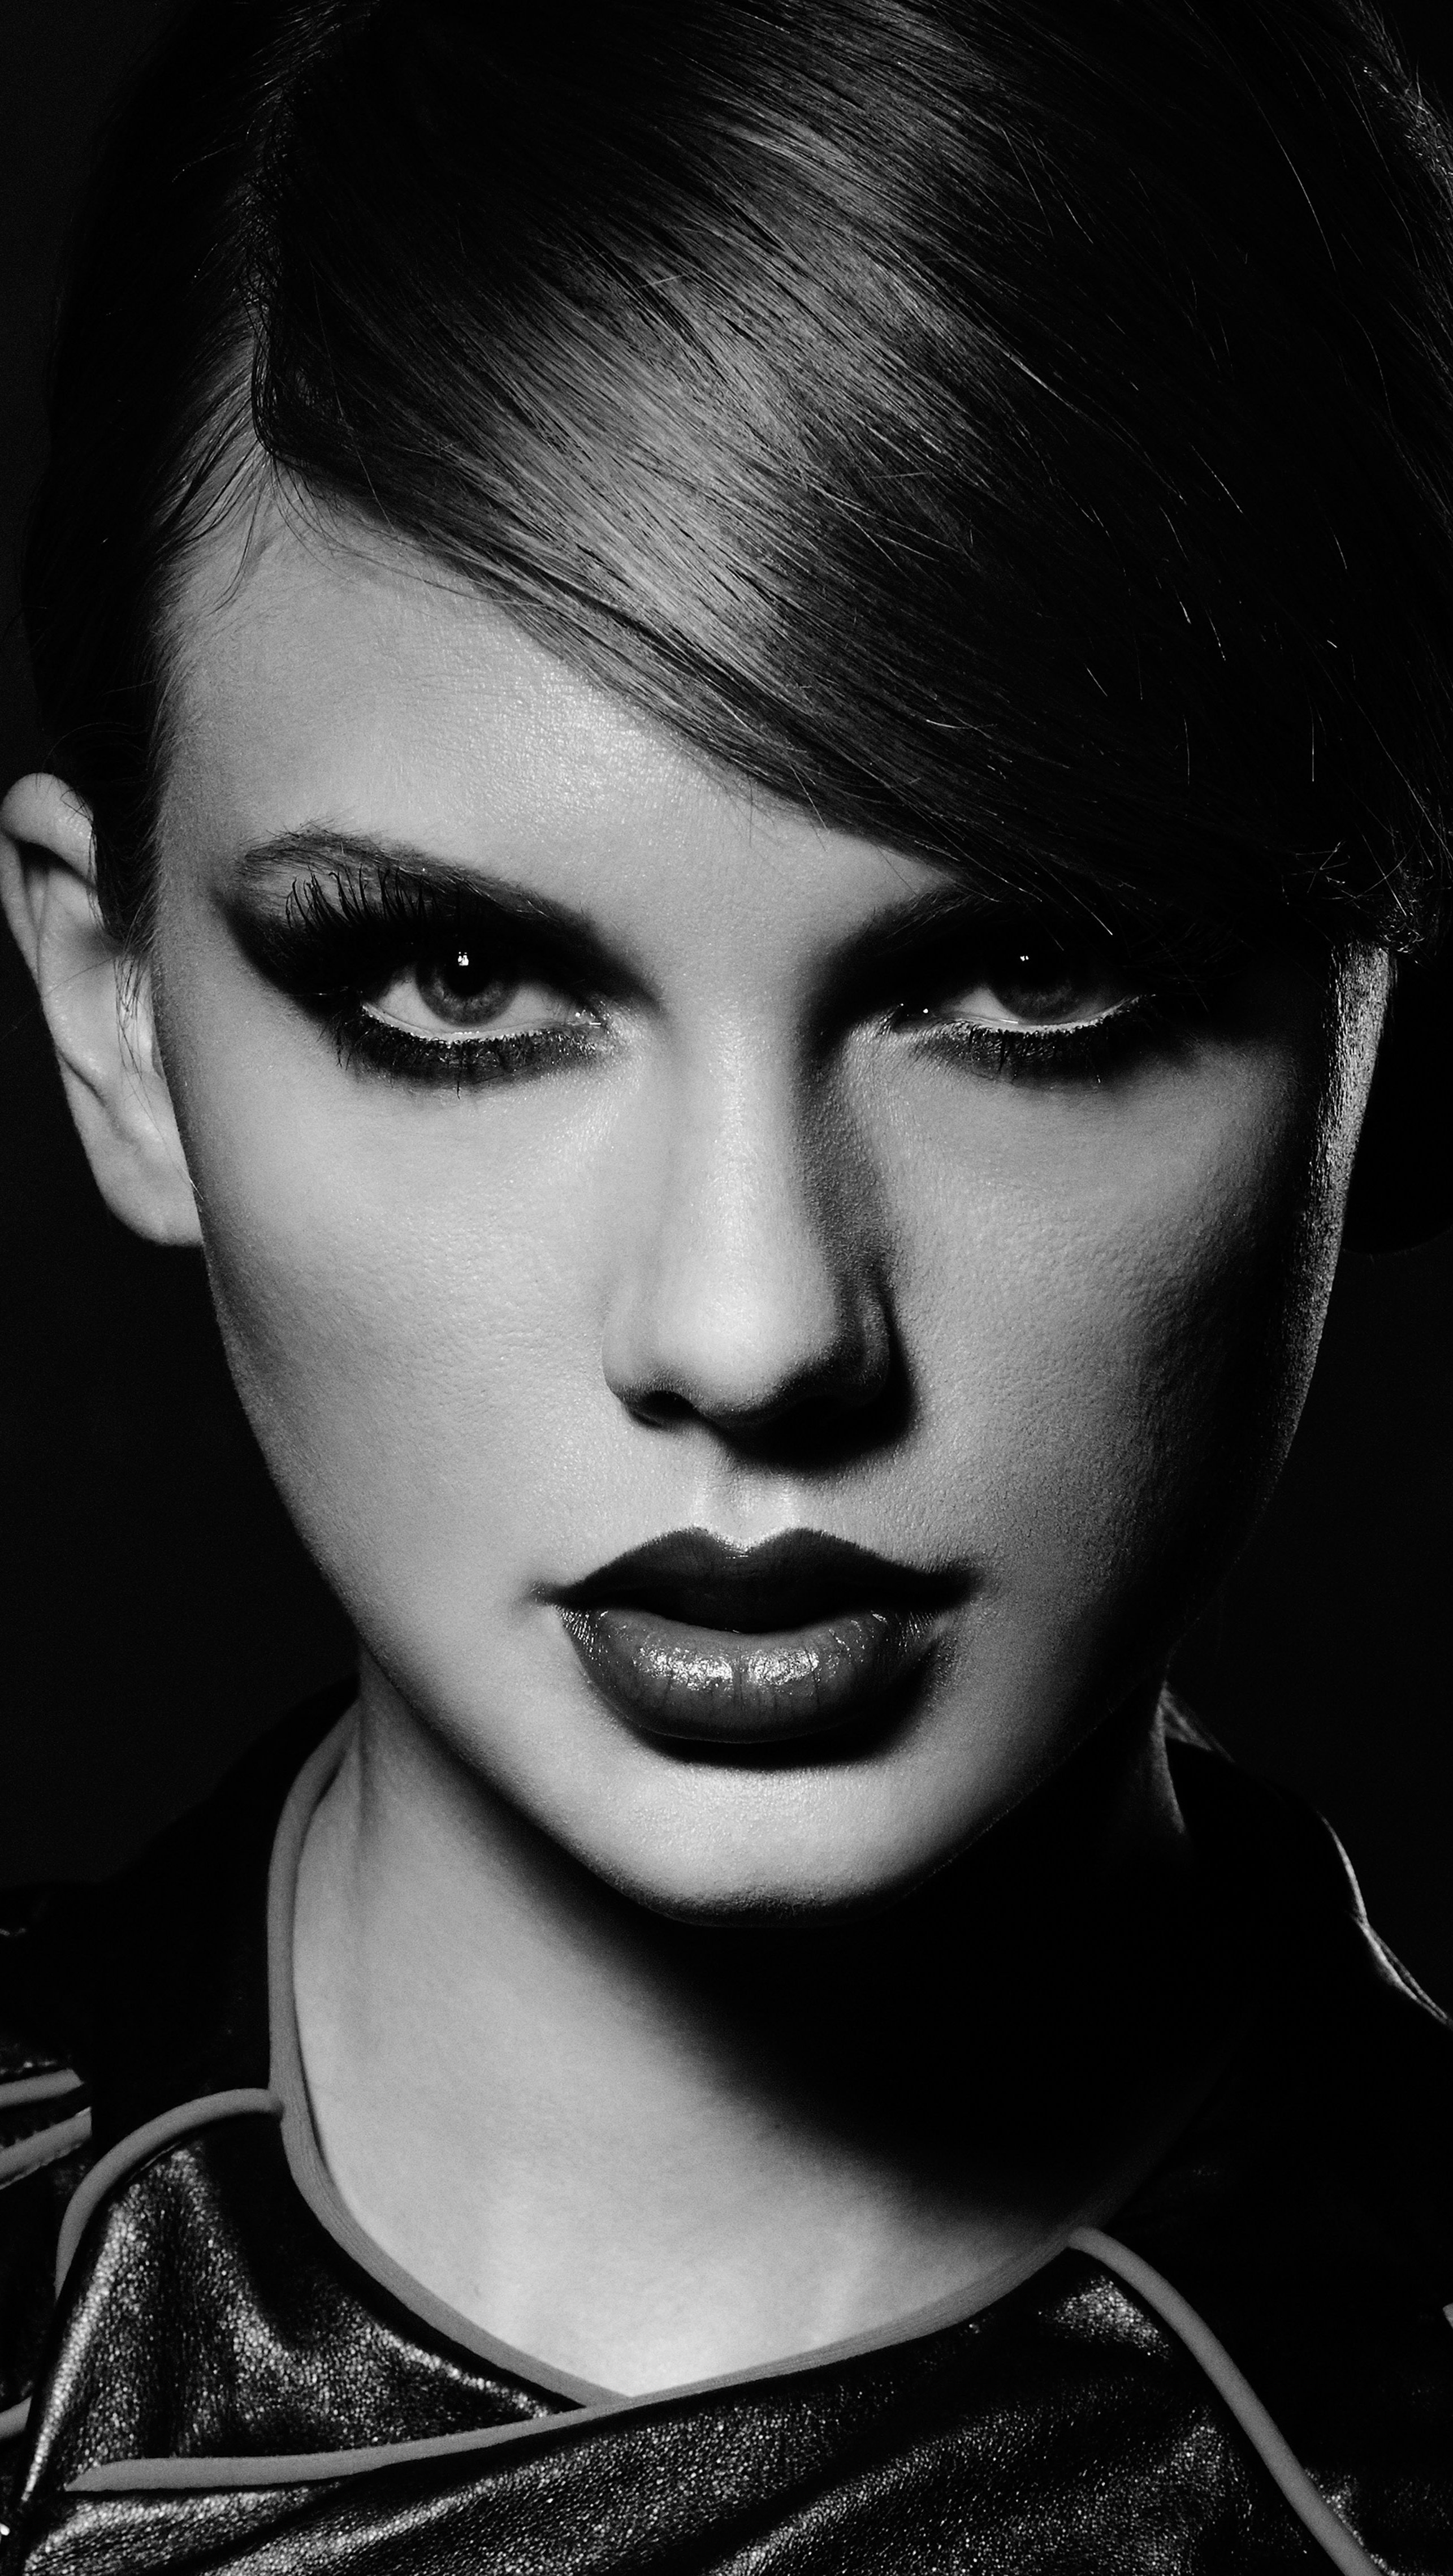 Wallpaper Taylor Swift in Grayscale Vertical